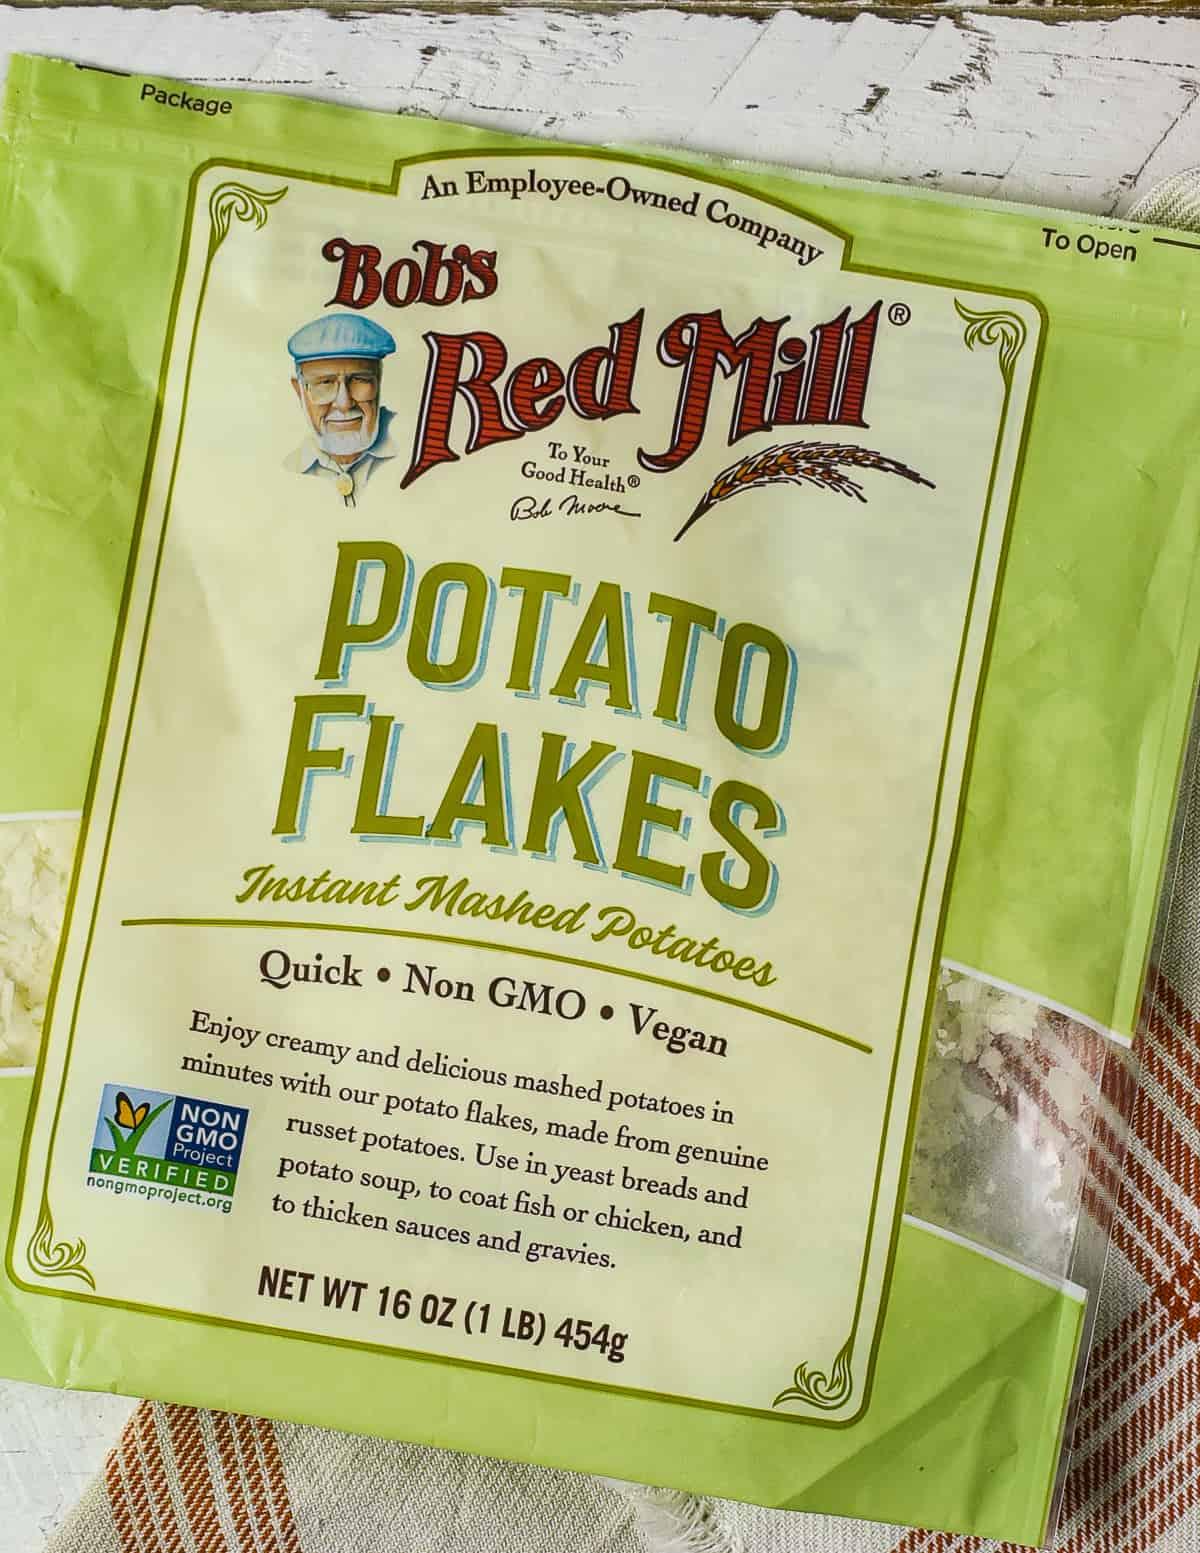 Bob's red mill potato flakes.